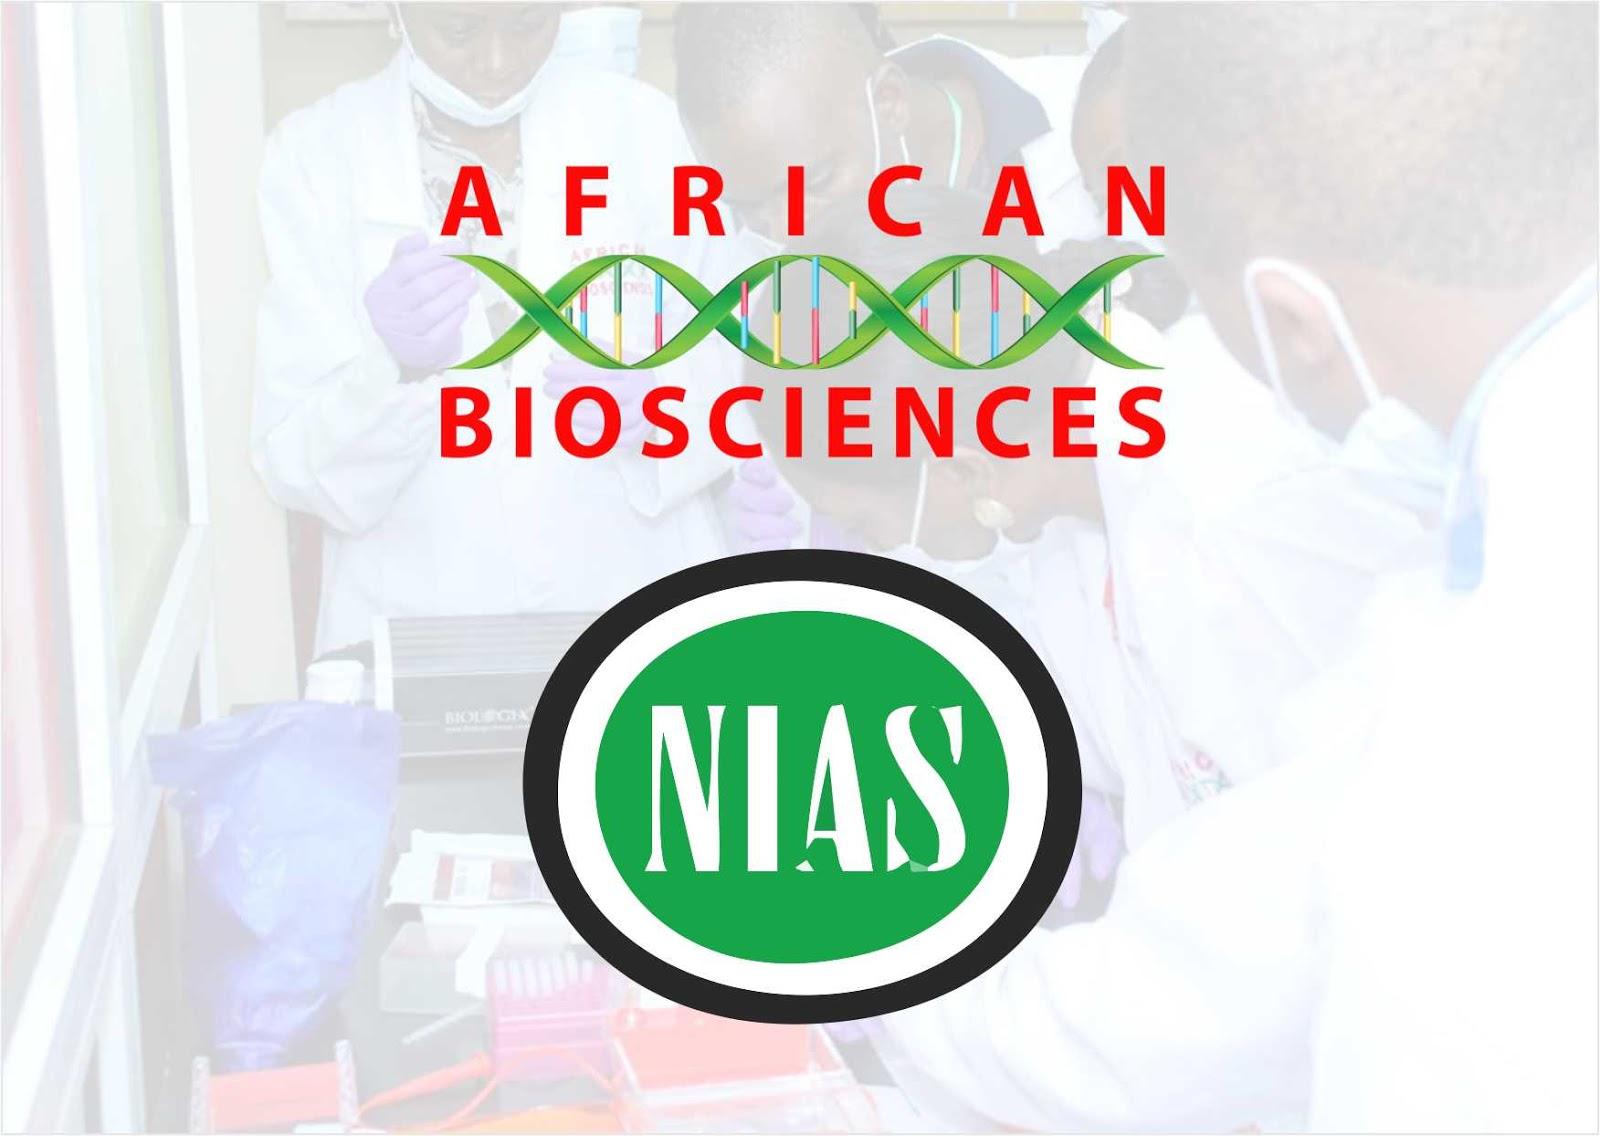 Border closure saves Nigeria's poultry industry N50b -NIAS boss